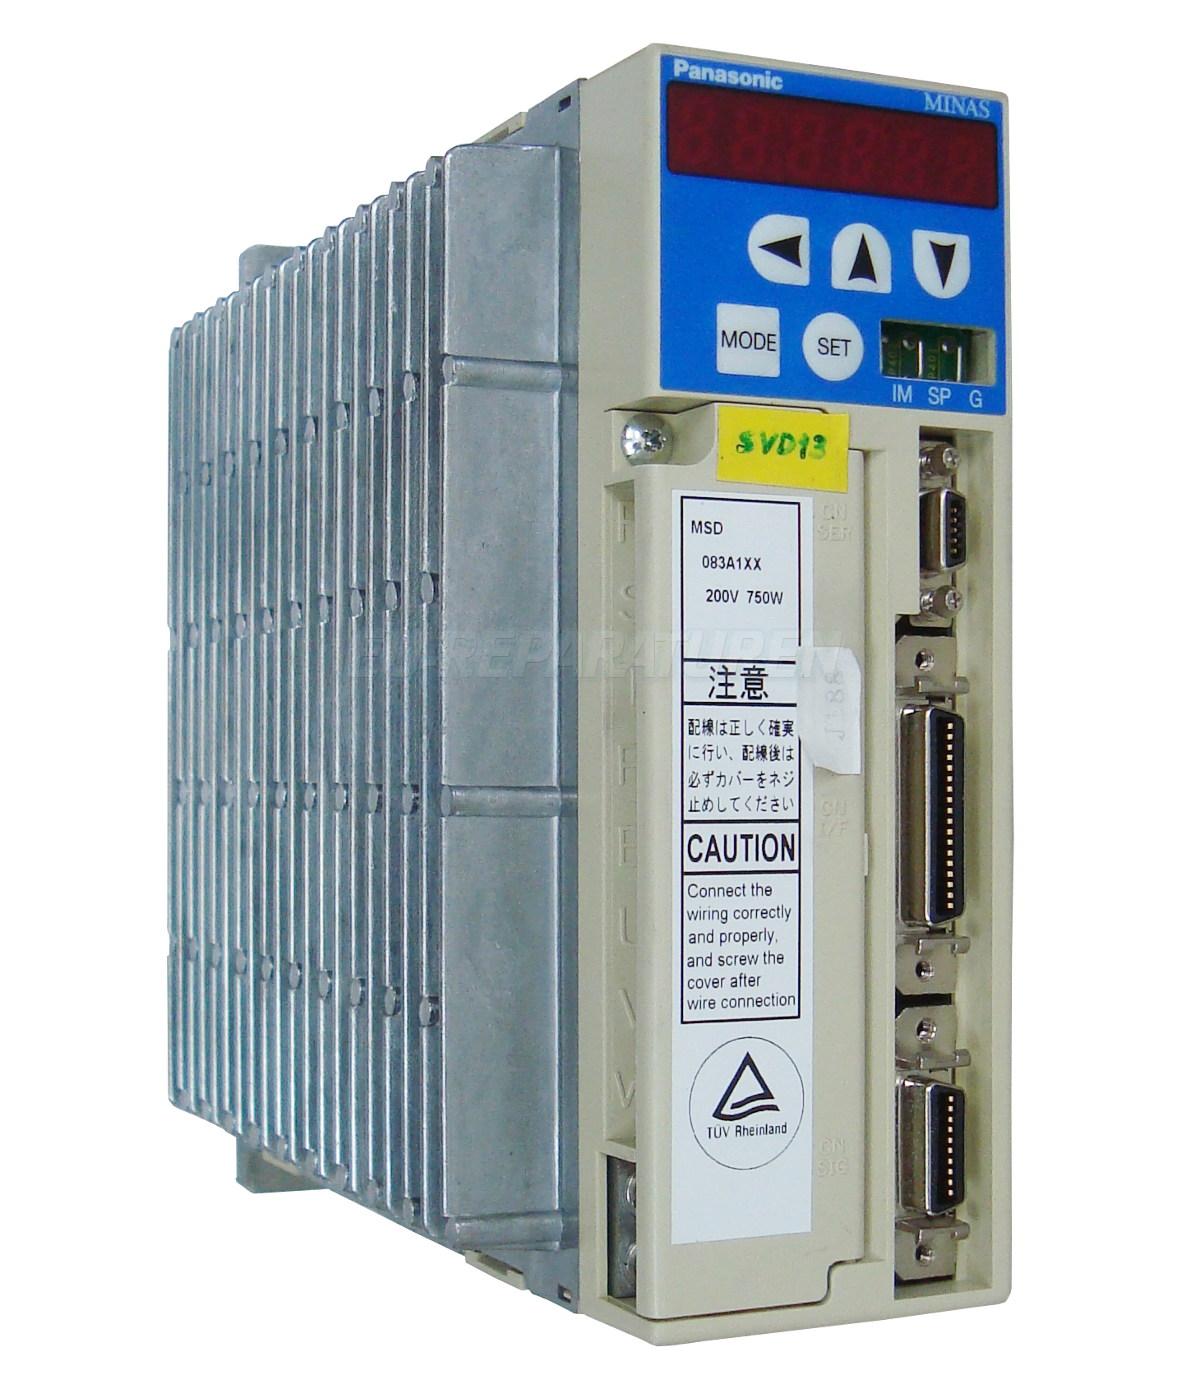 Reparatur Panasonic MSD083A1XX AC DRIVE